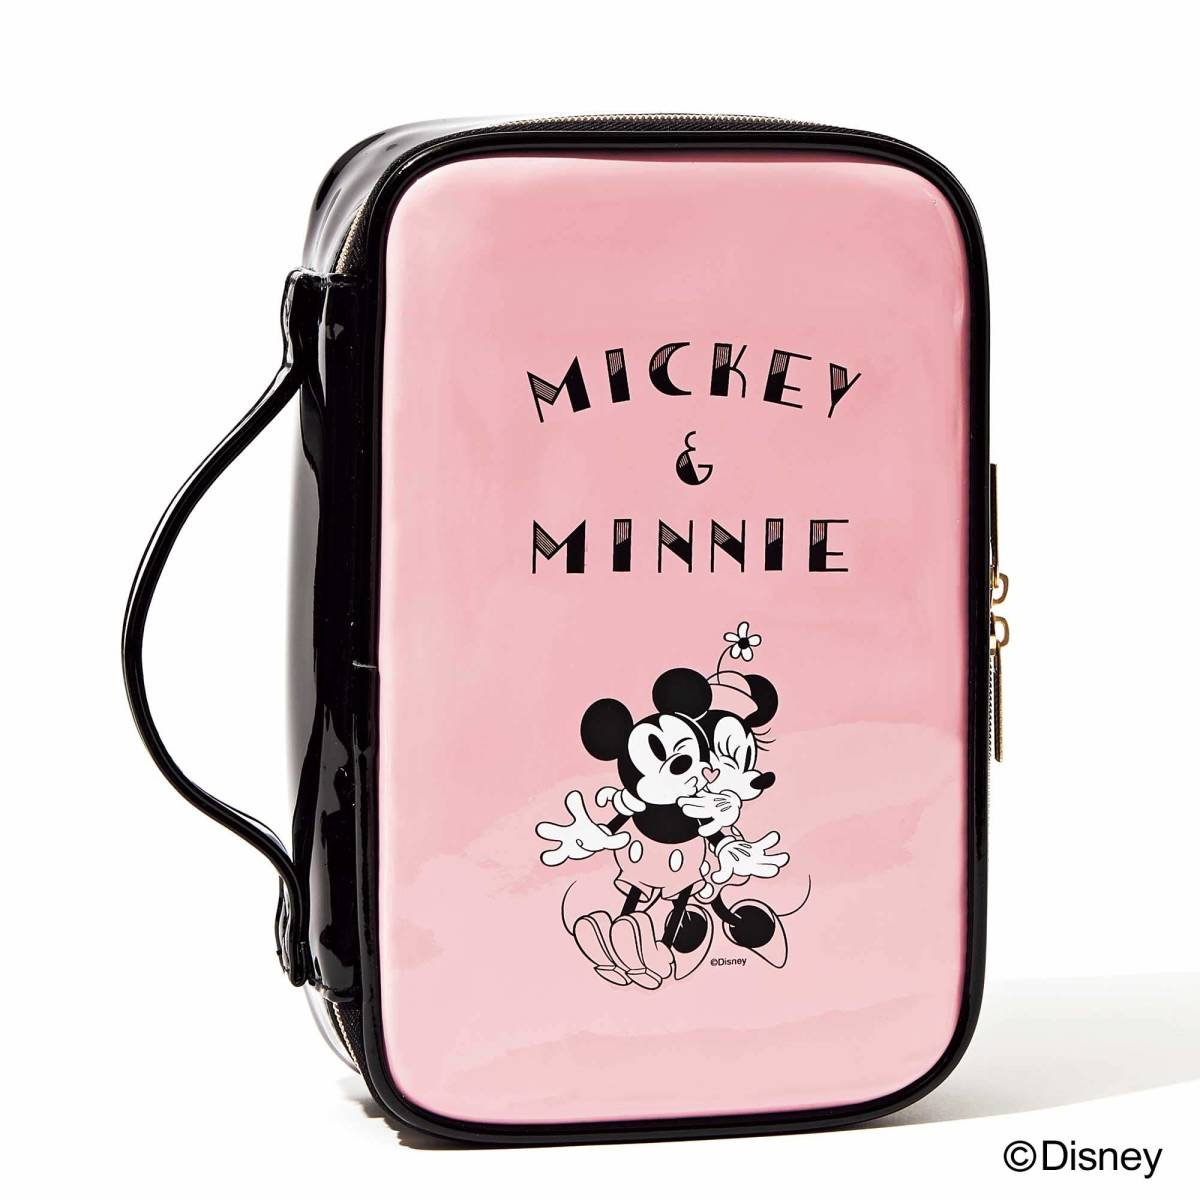 sweet スウィート 2020年8月号 付録◆ディズニー ミッキー&ミニー ドレッサーポーチ_画像1